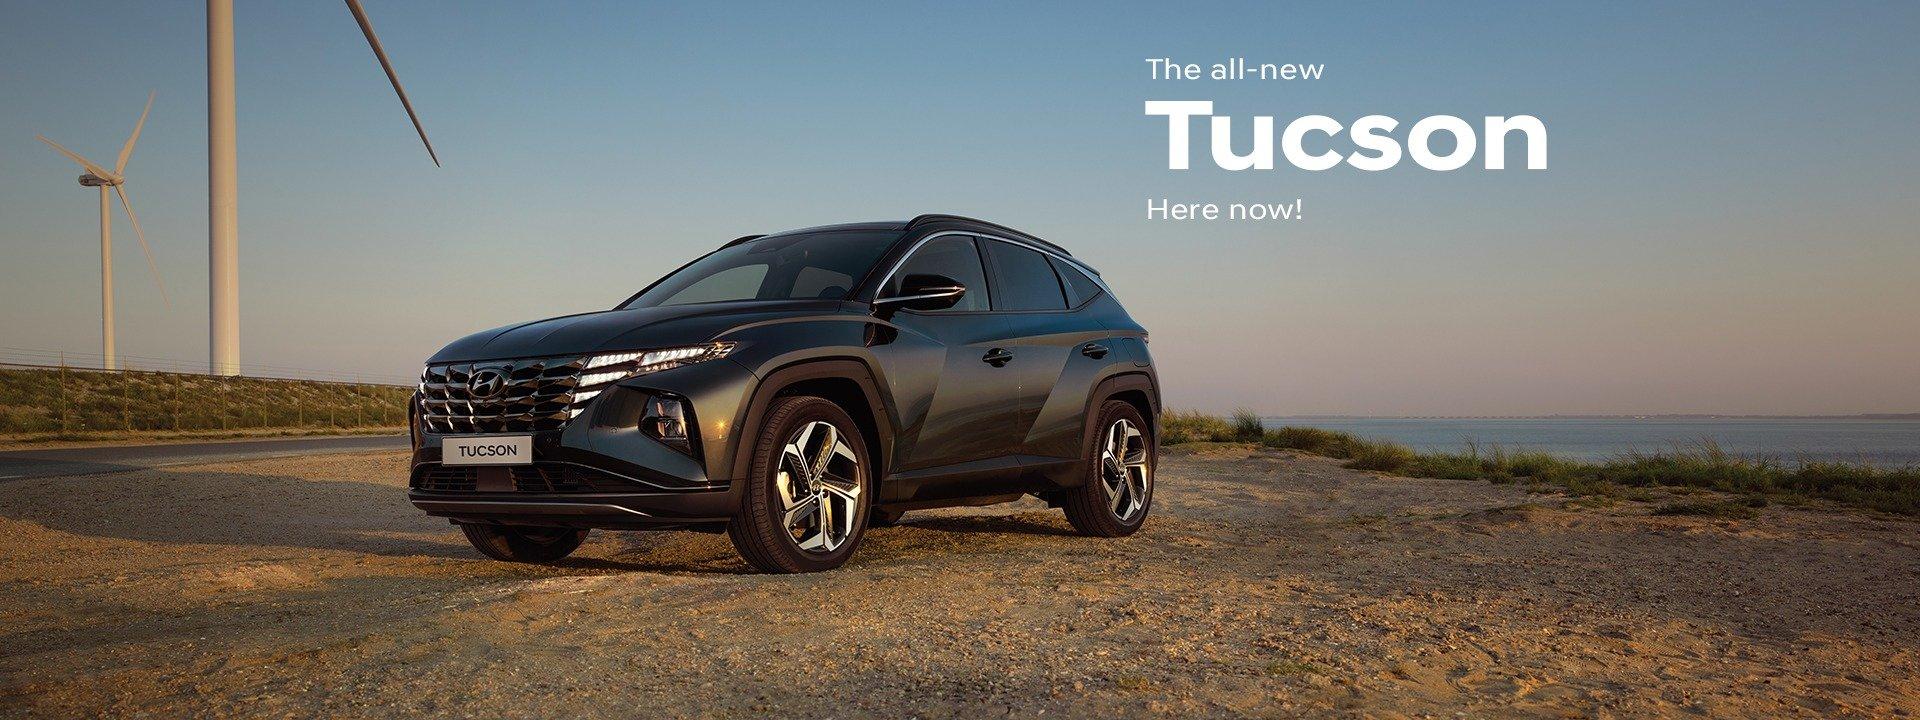 Mandurah-Hyundai-all-new-tucson